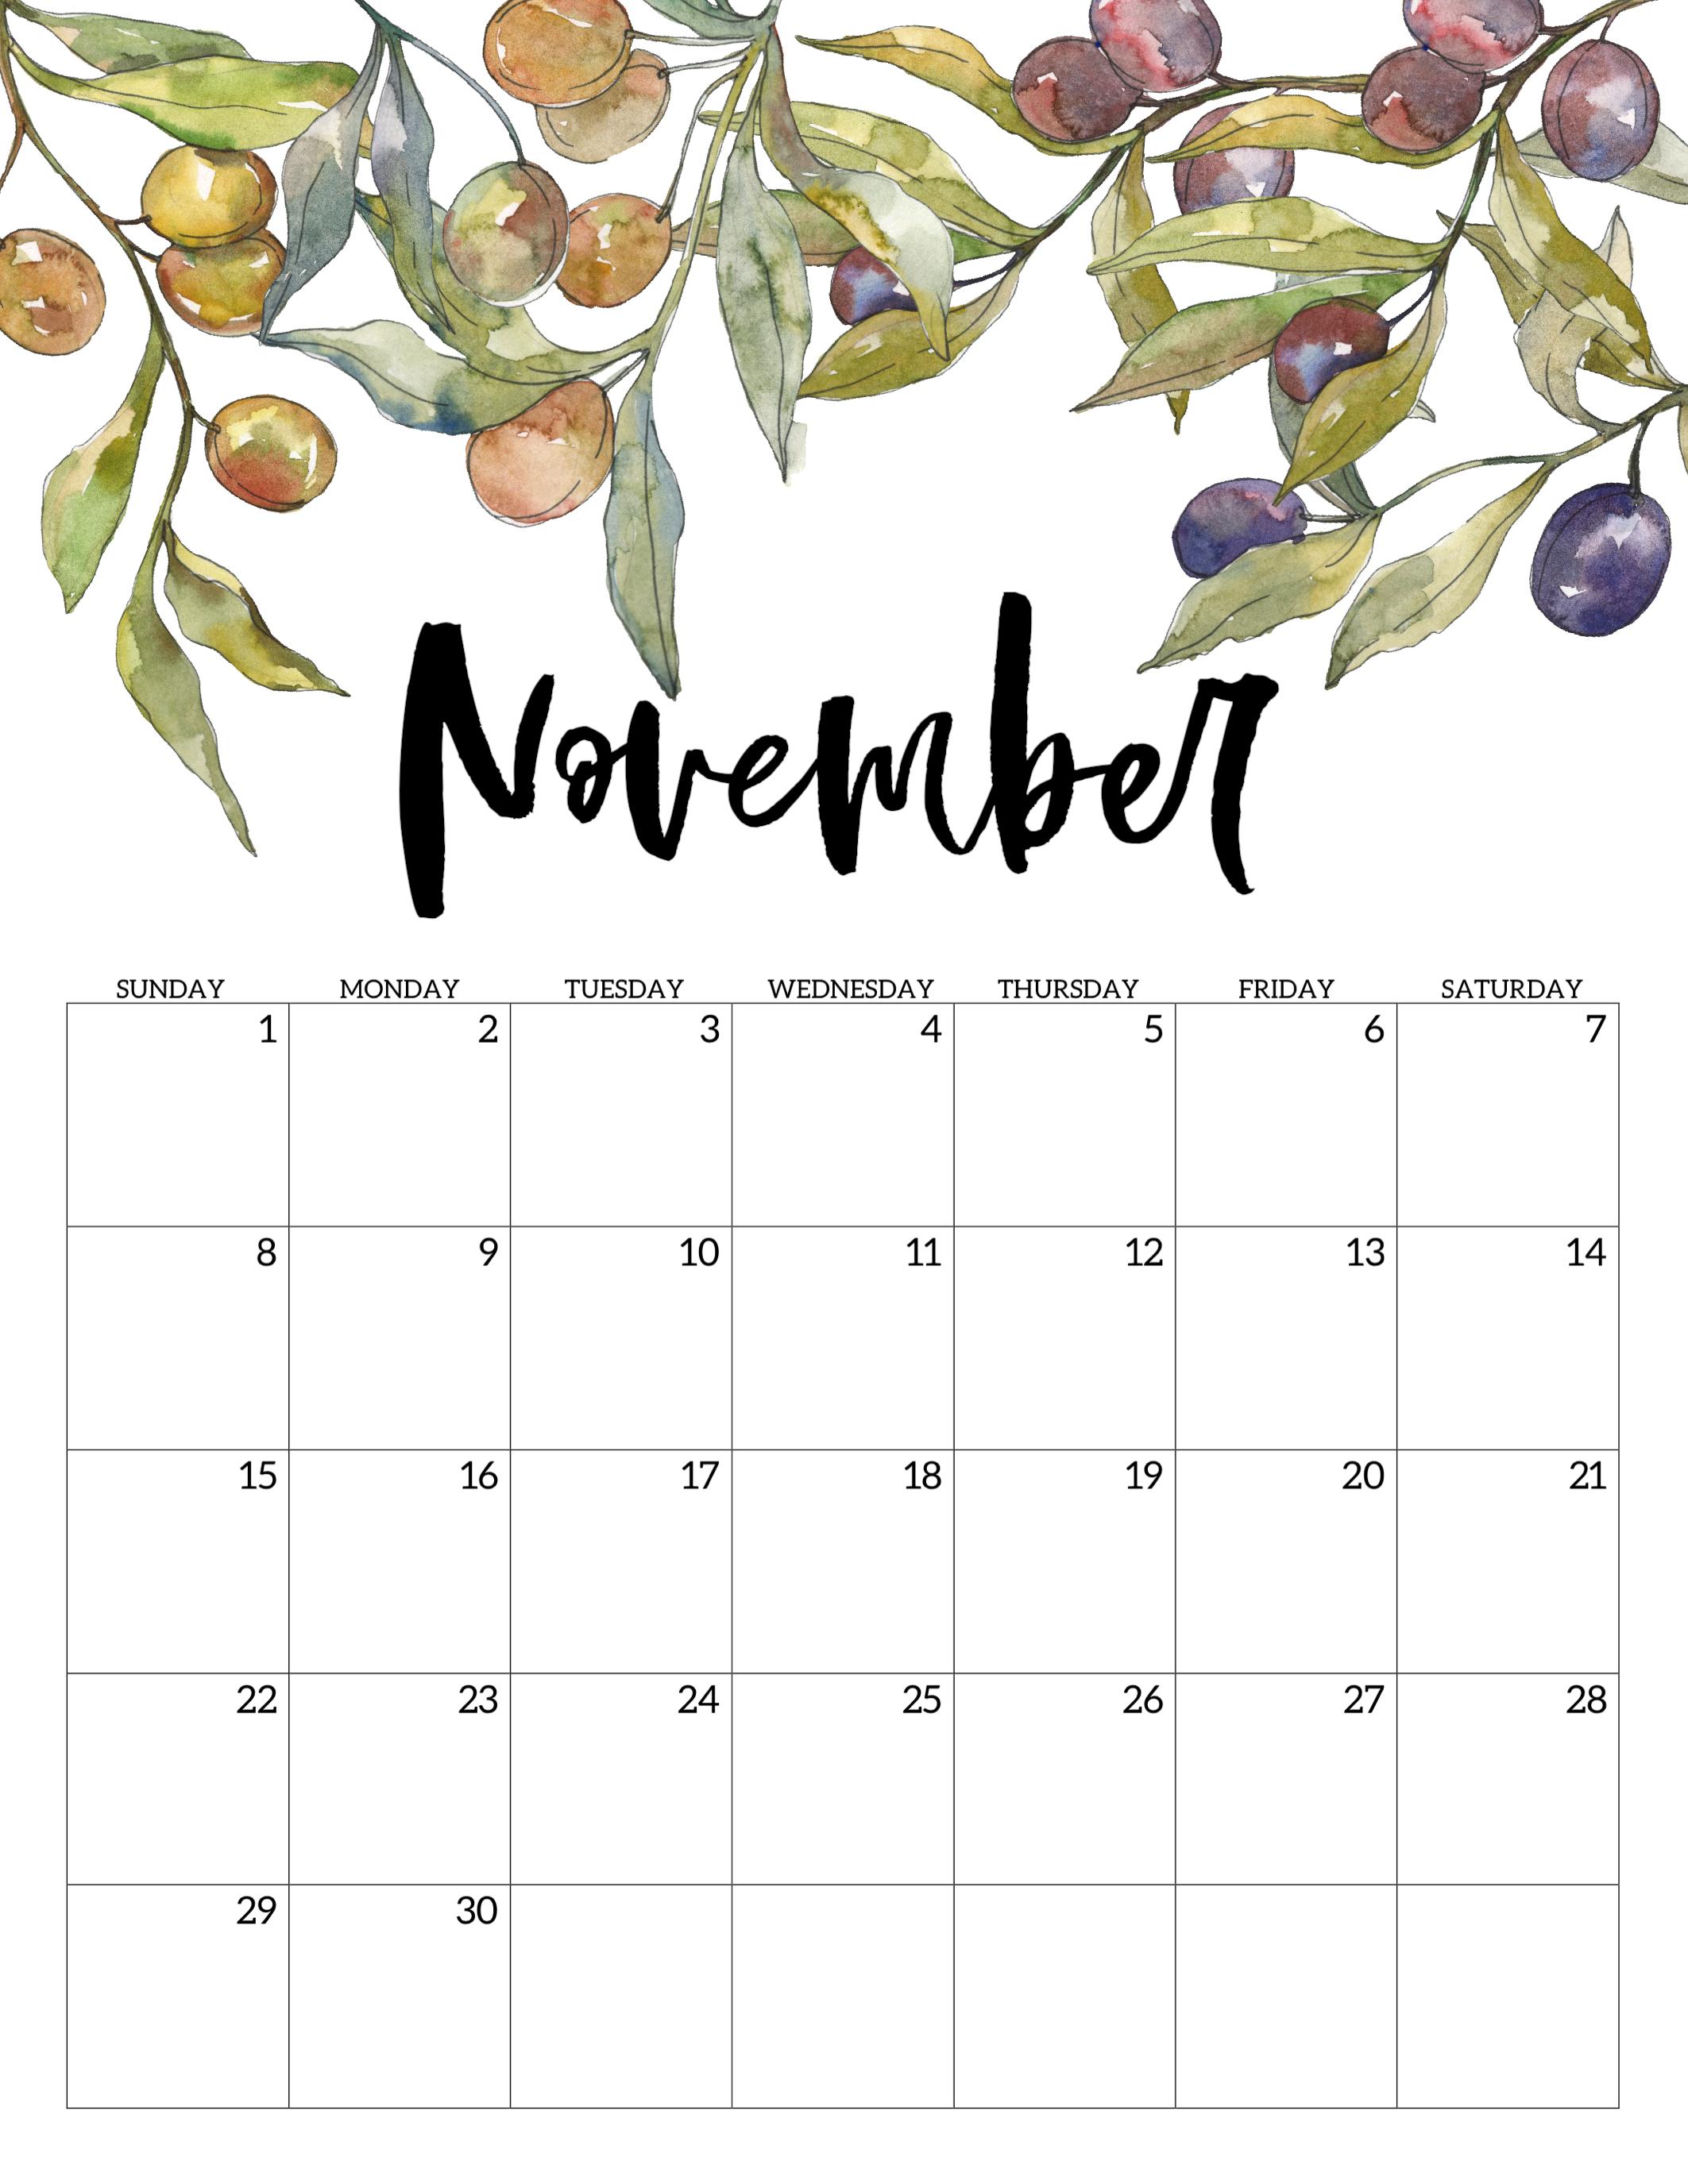 2020 Free Printable Calendar  Floral  Paper Trail Design throughout October & November 2020 Calendar